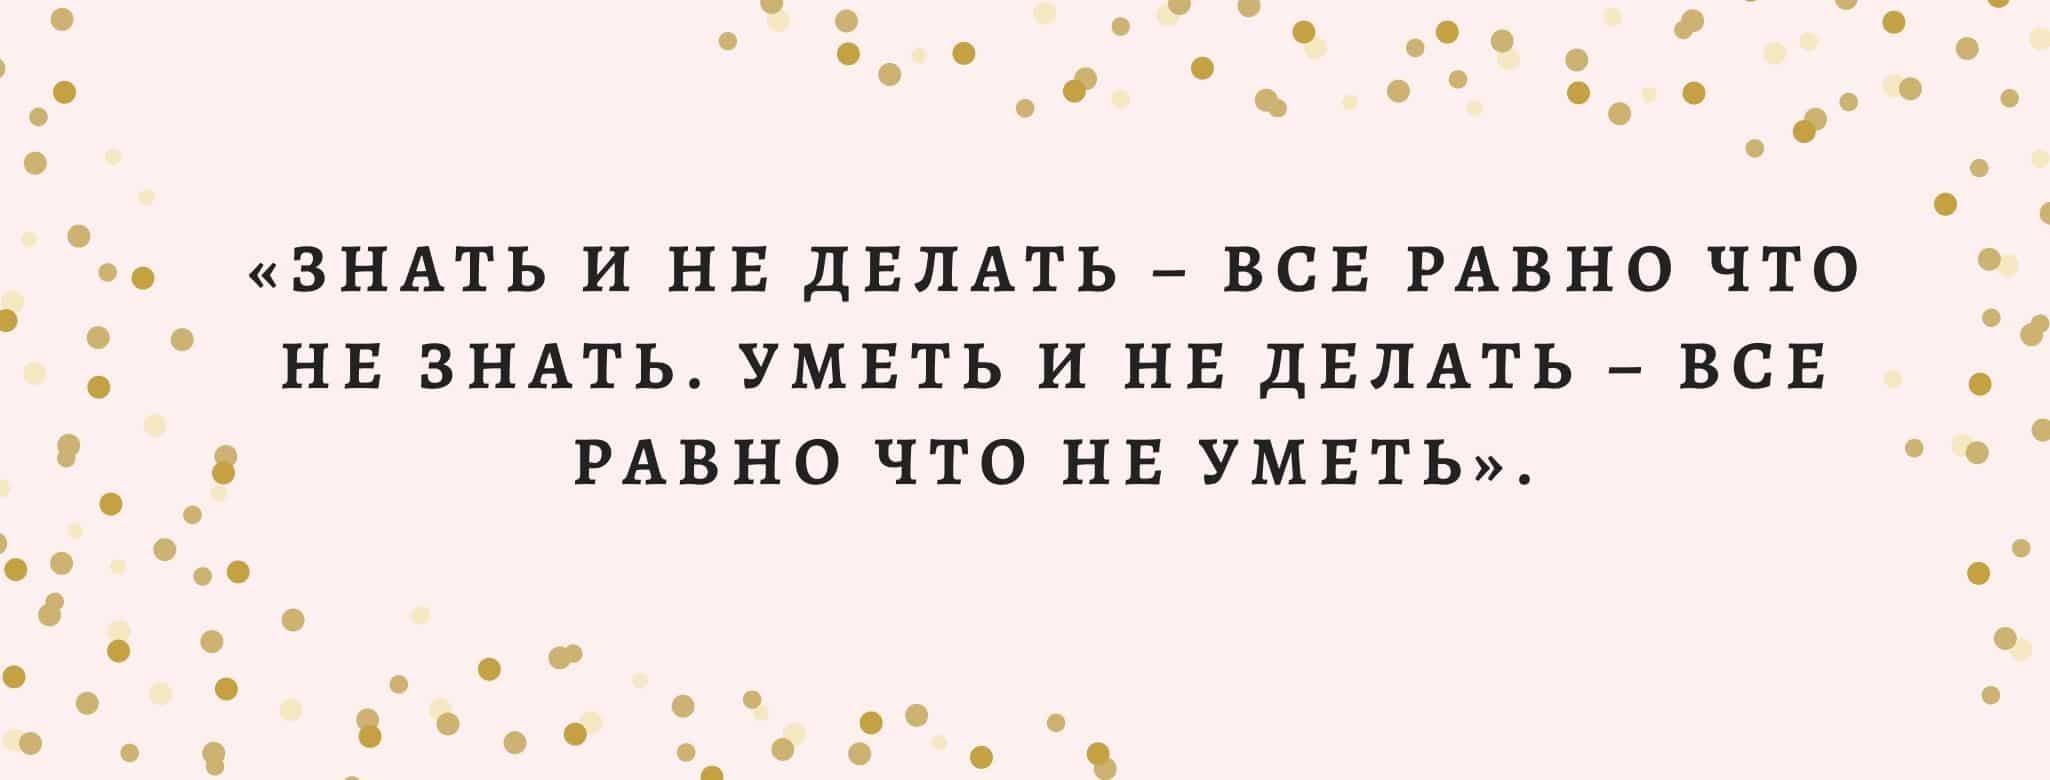 Угадай книгу по цитате